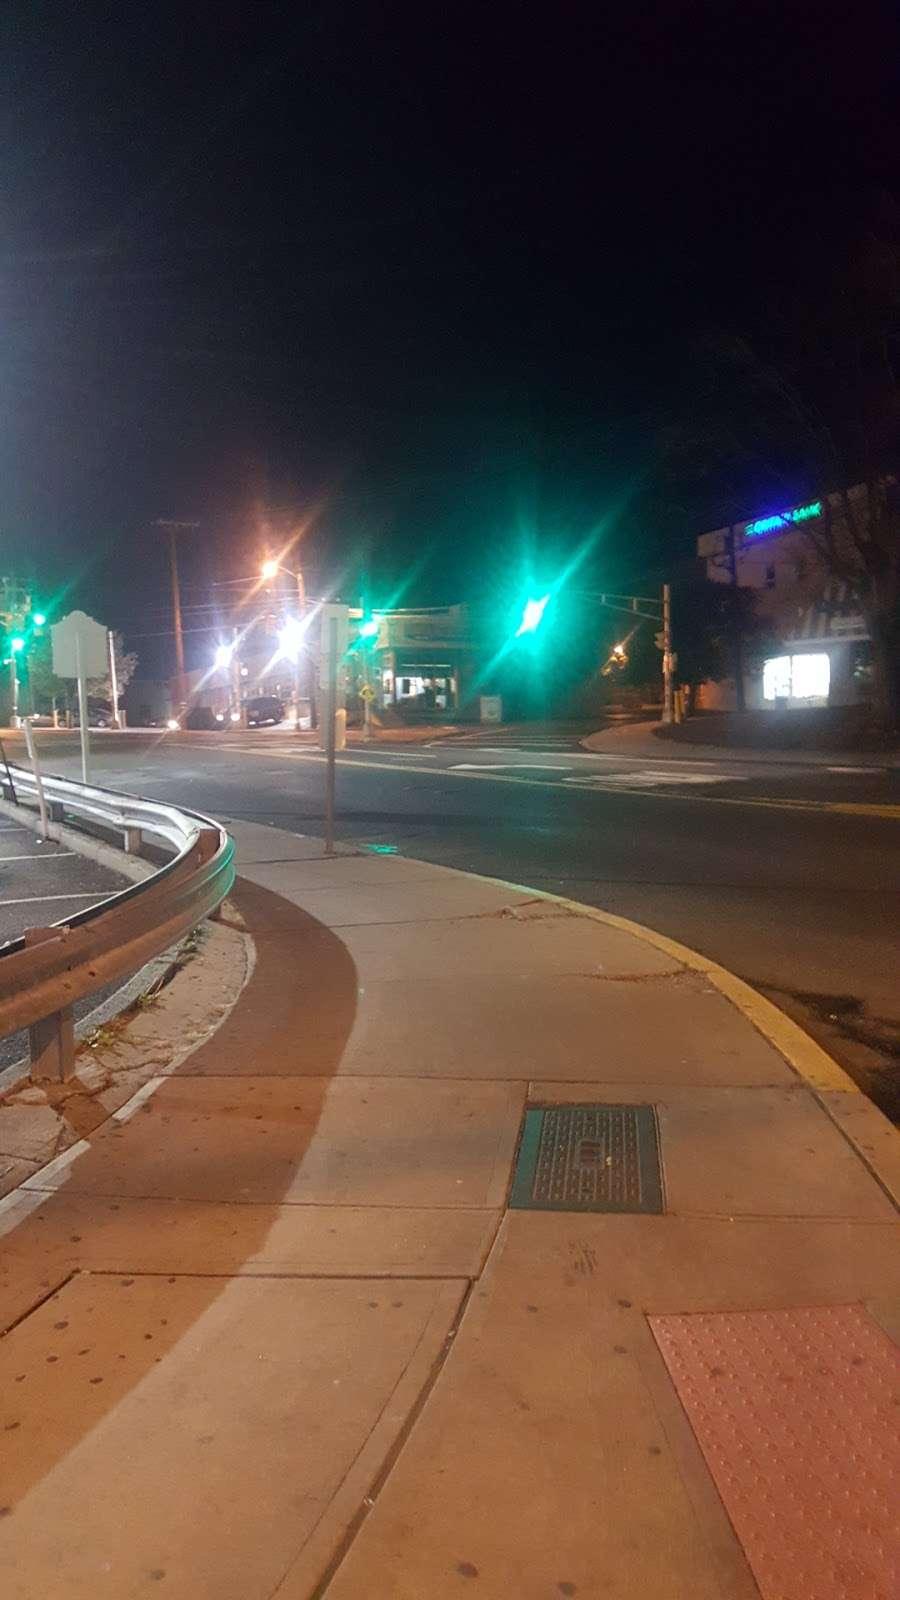 Delta Gas Station - gas station  | Photo 7 of 9 | Address: 9280 John Fitzgerald Kennedy Blvd, North Bergen, NJ 07047, USA | Phone: (201) 854-3800